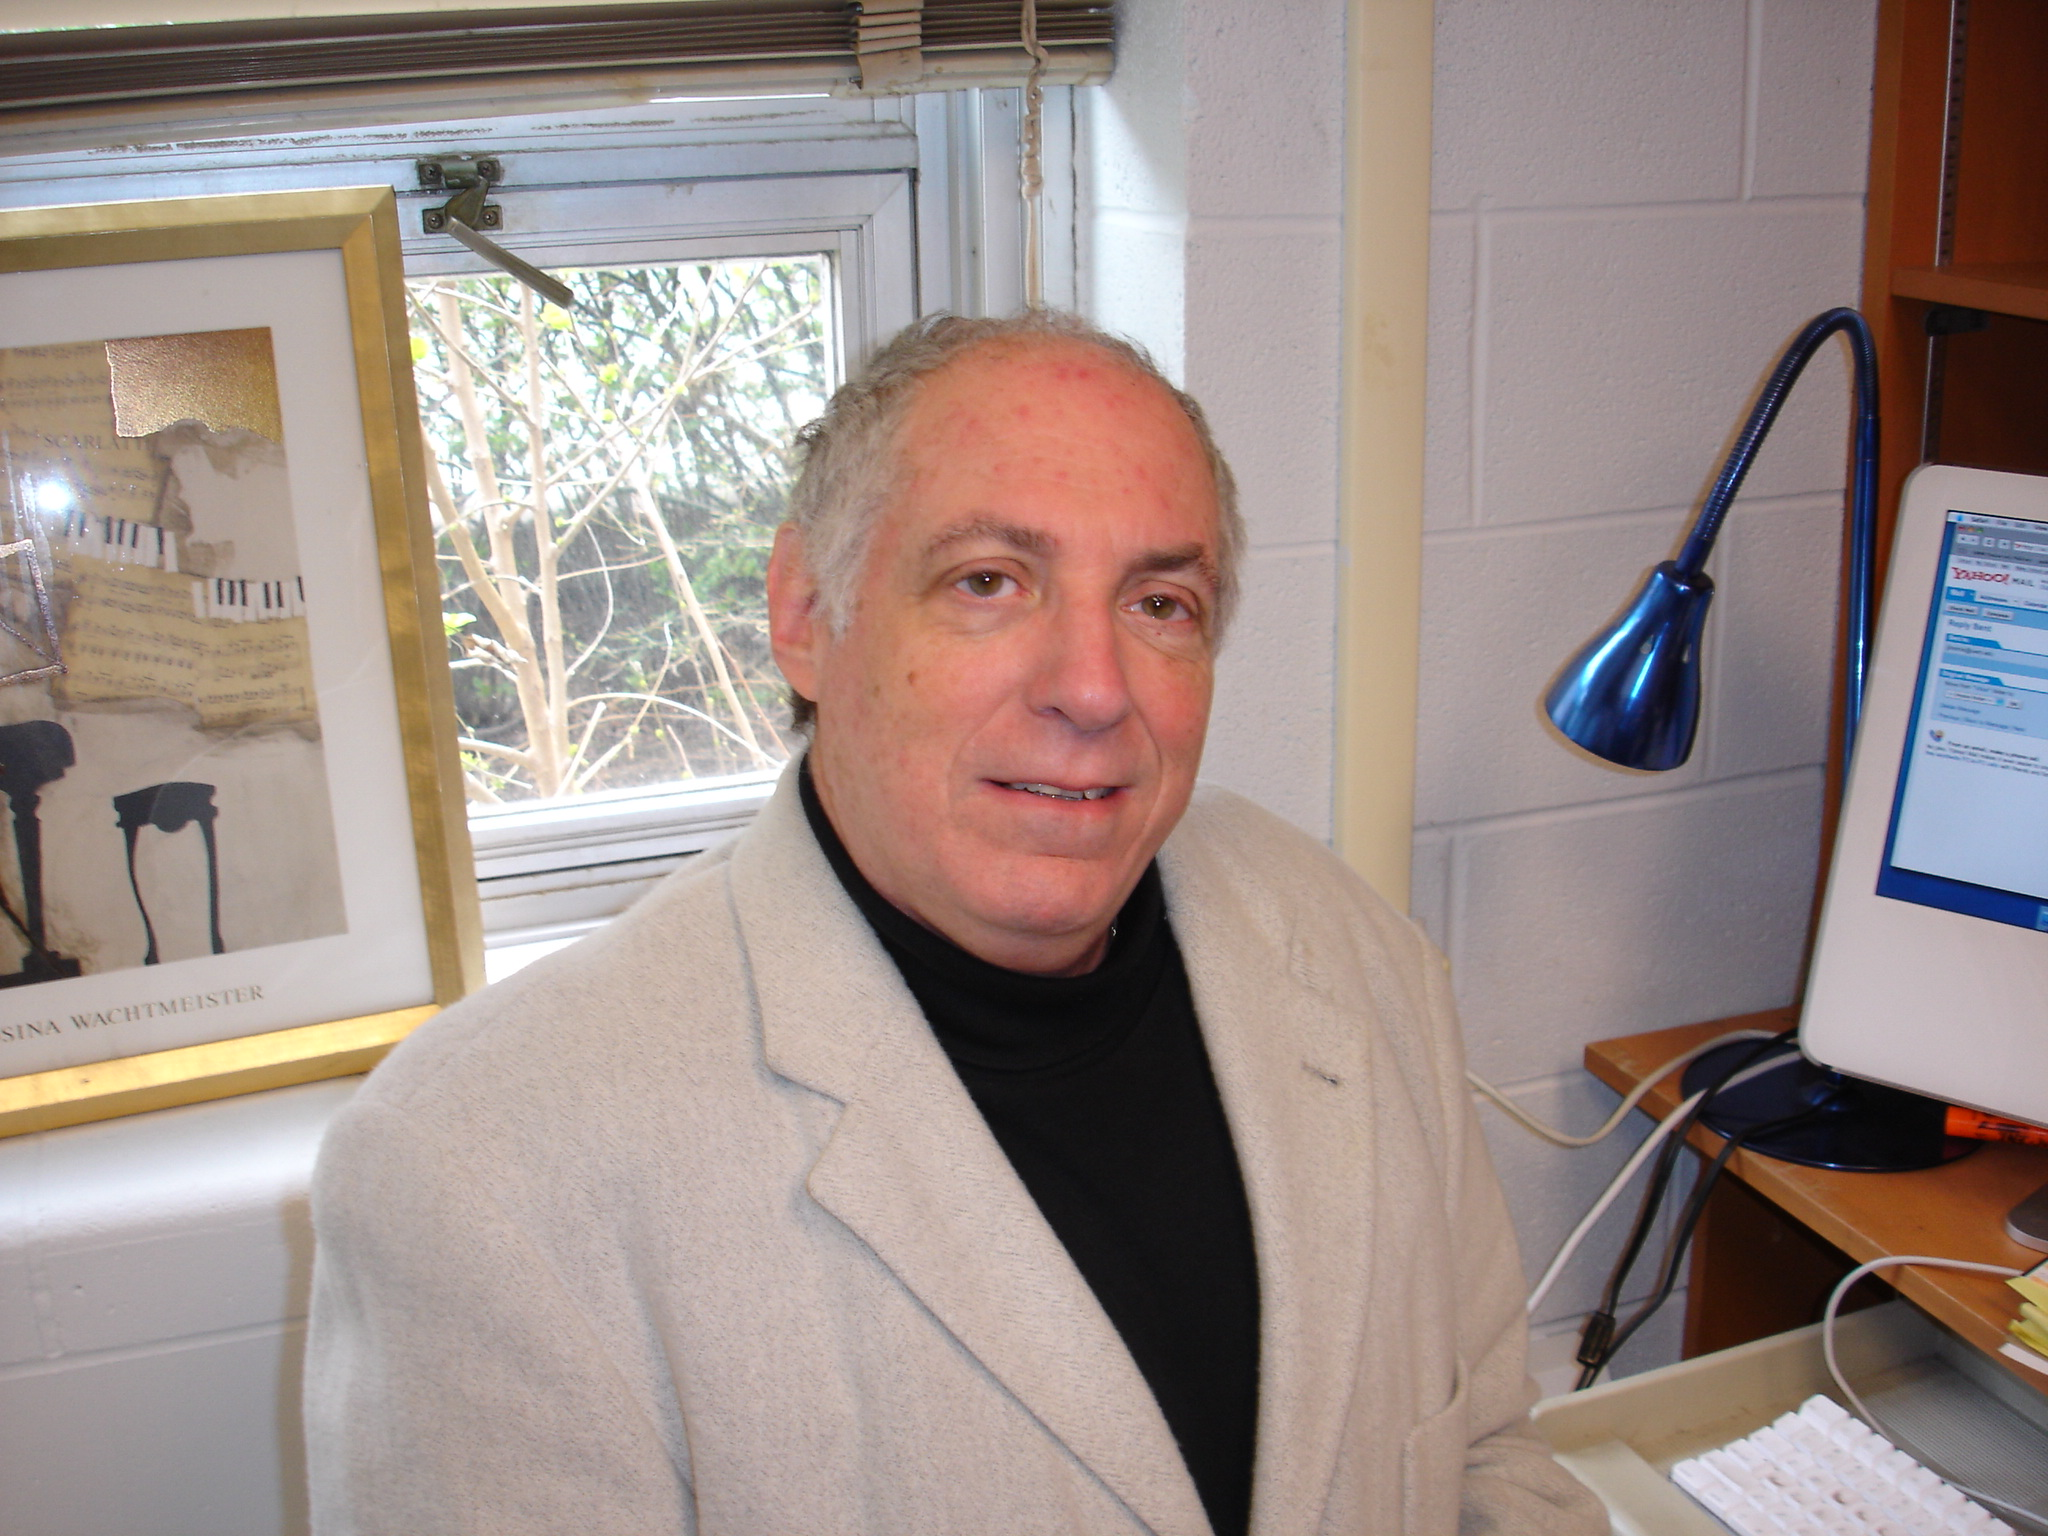 Dr. Edward F. Anhalt - Founder and CEO